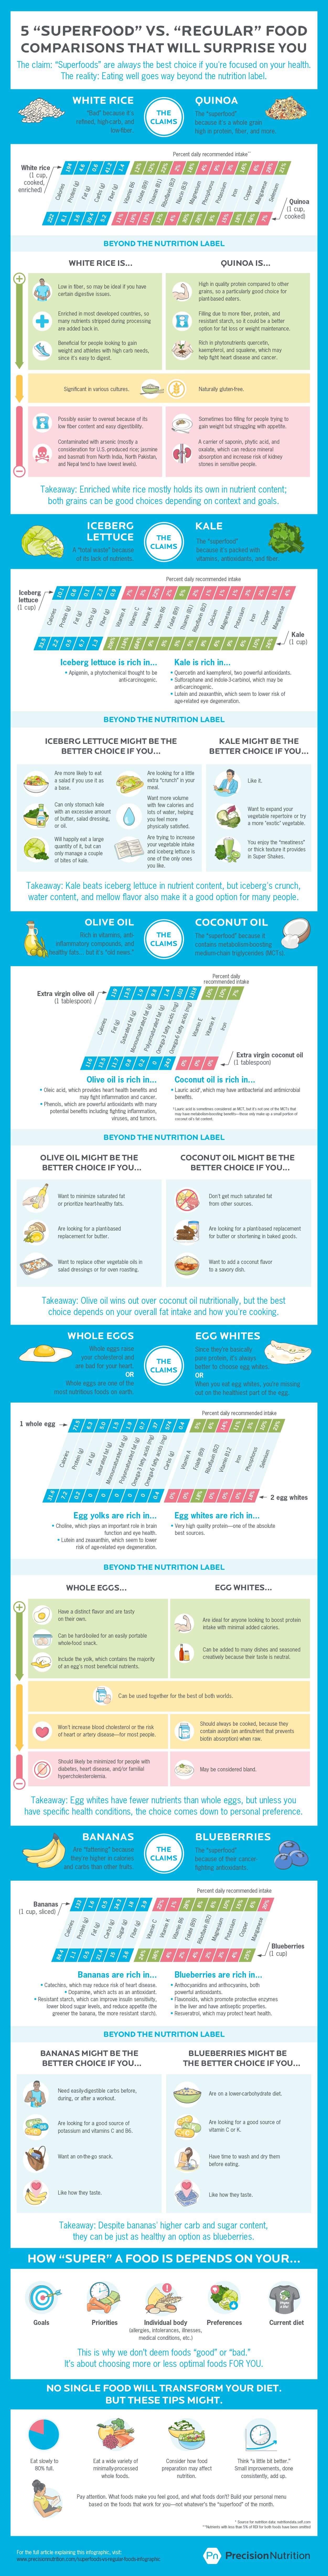 superfoods-vs-regular-foods-infographic-image